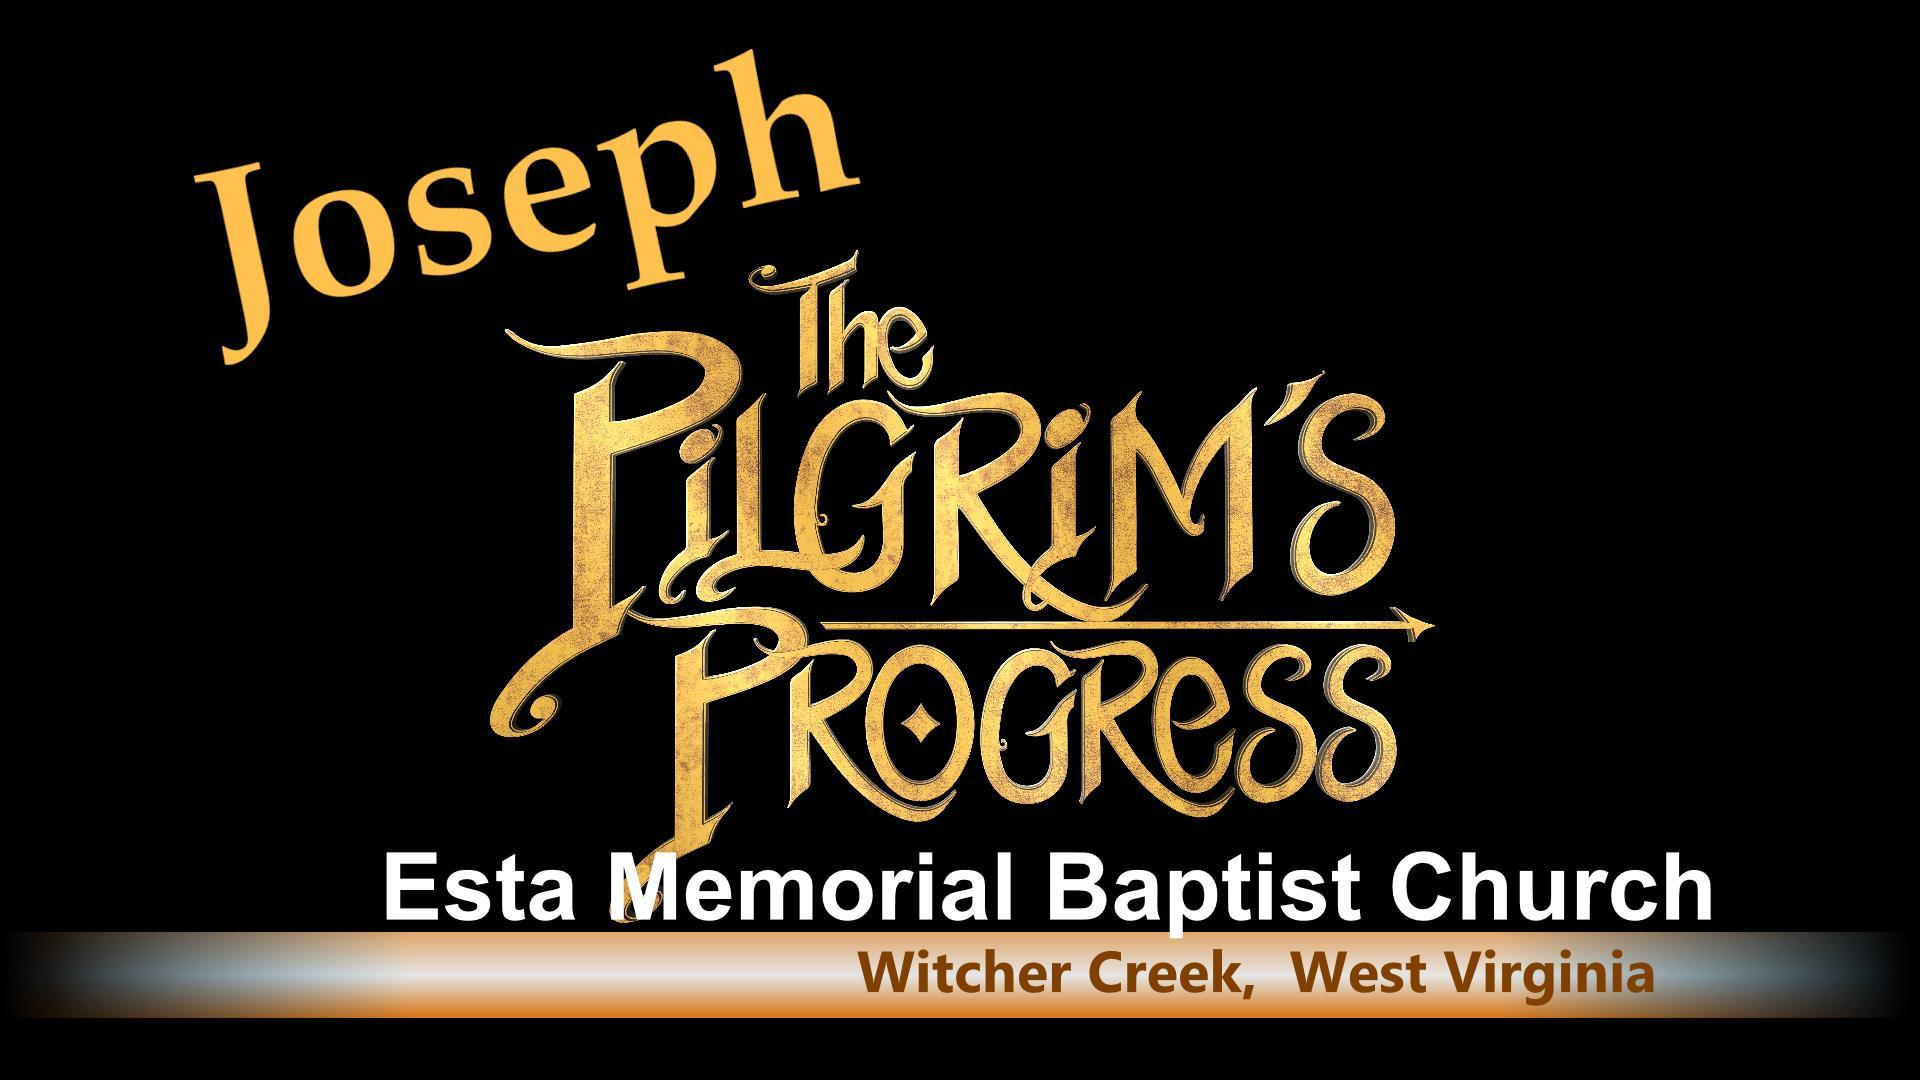 Joseph A Pilgrims Progress